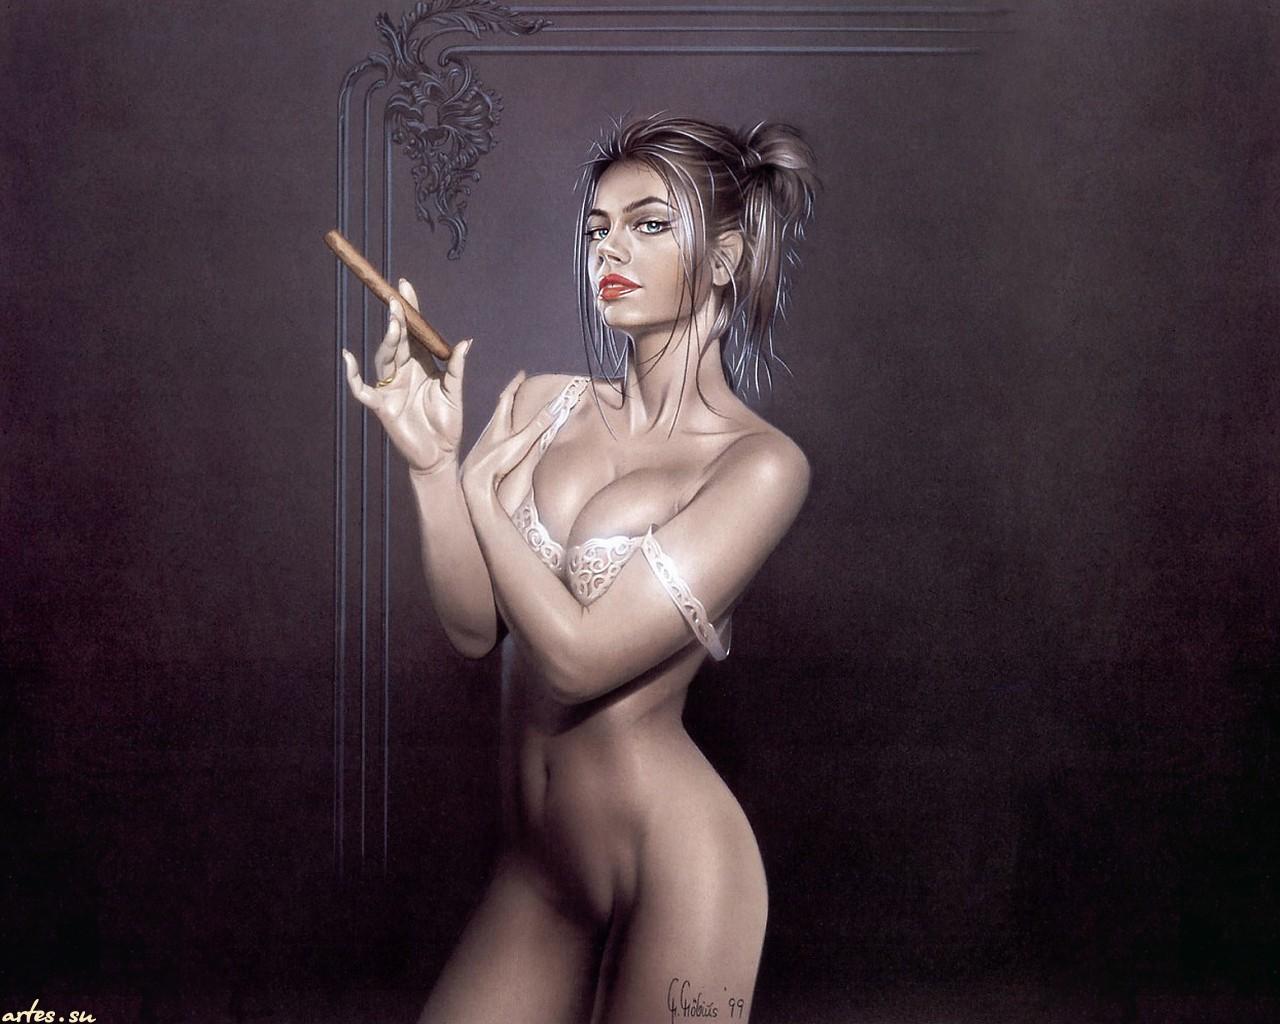 Сати казанова порно ххх 10 фотография